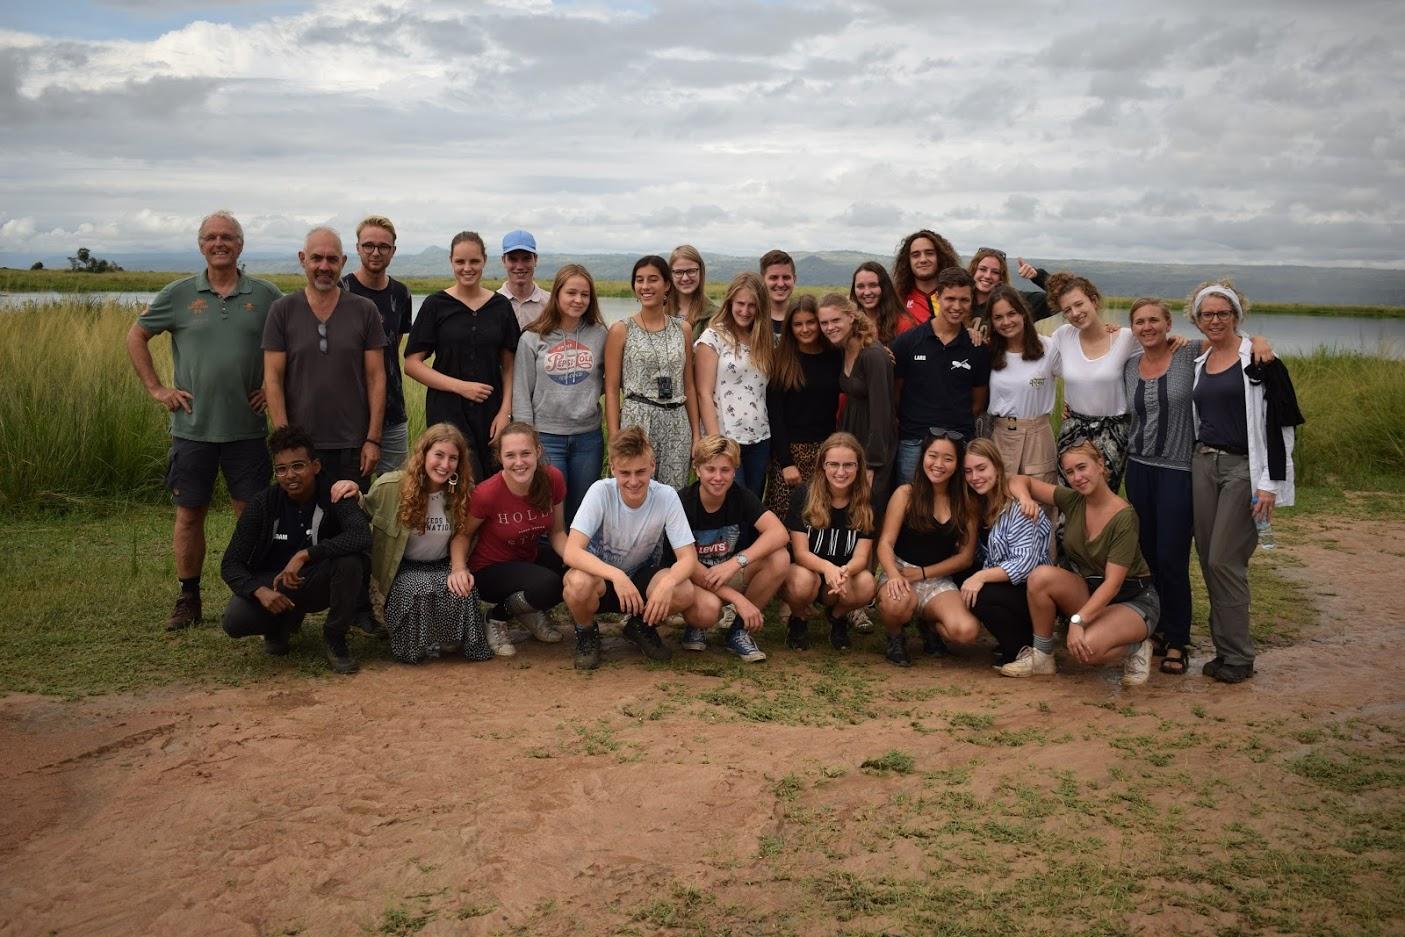 safari groepsfoto